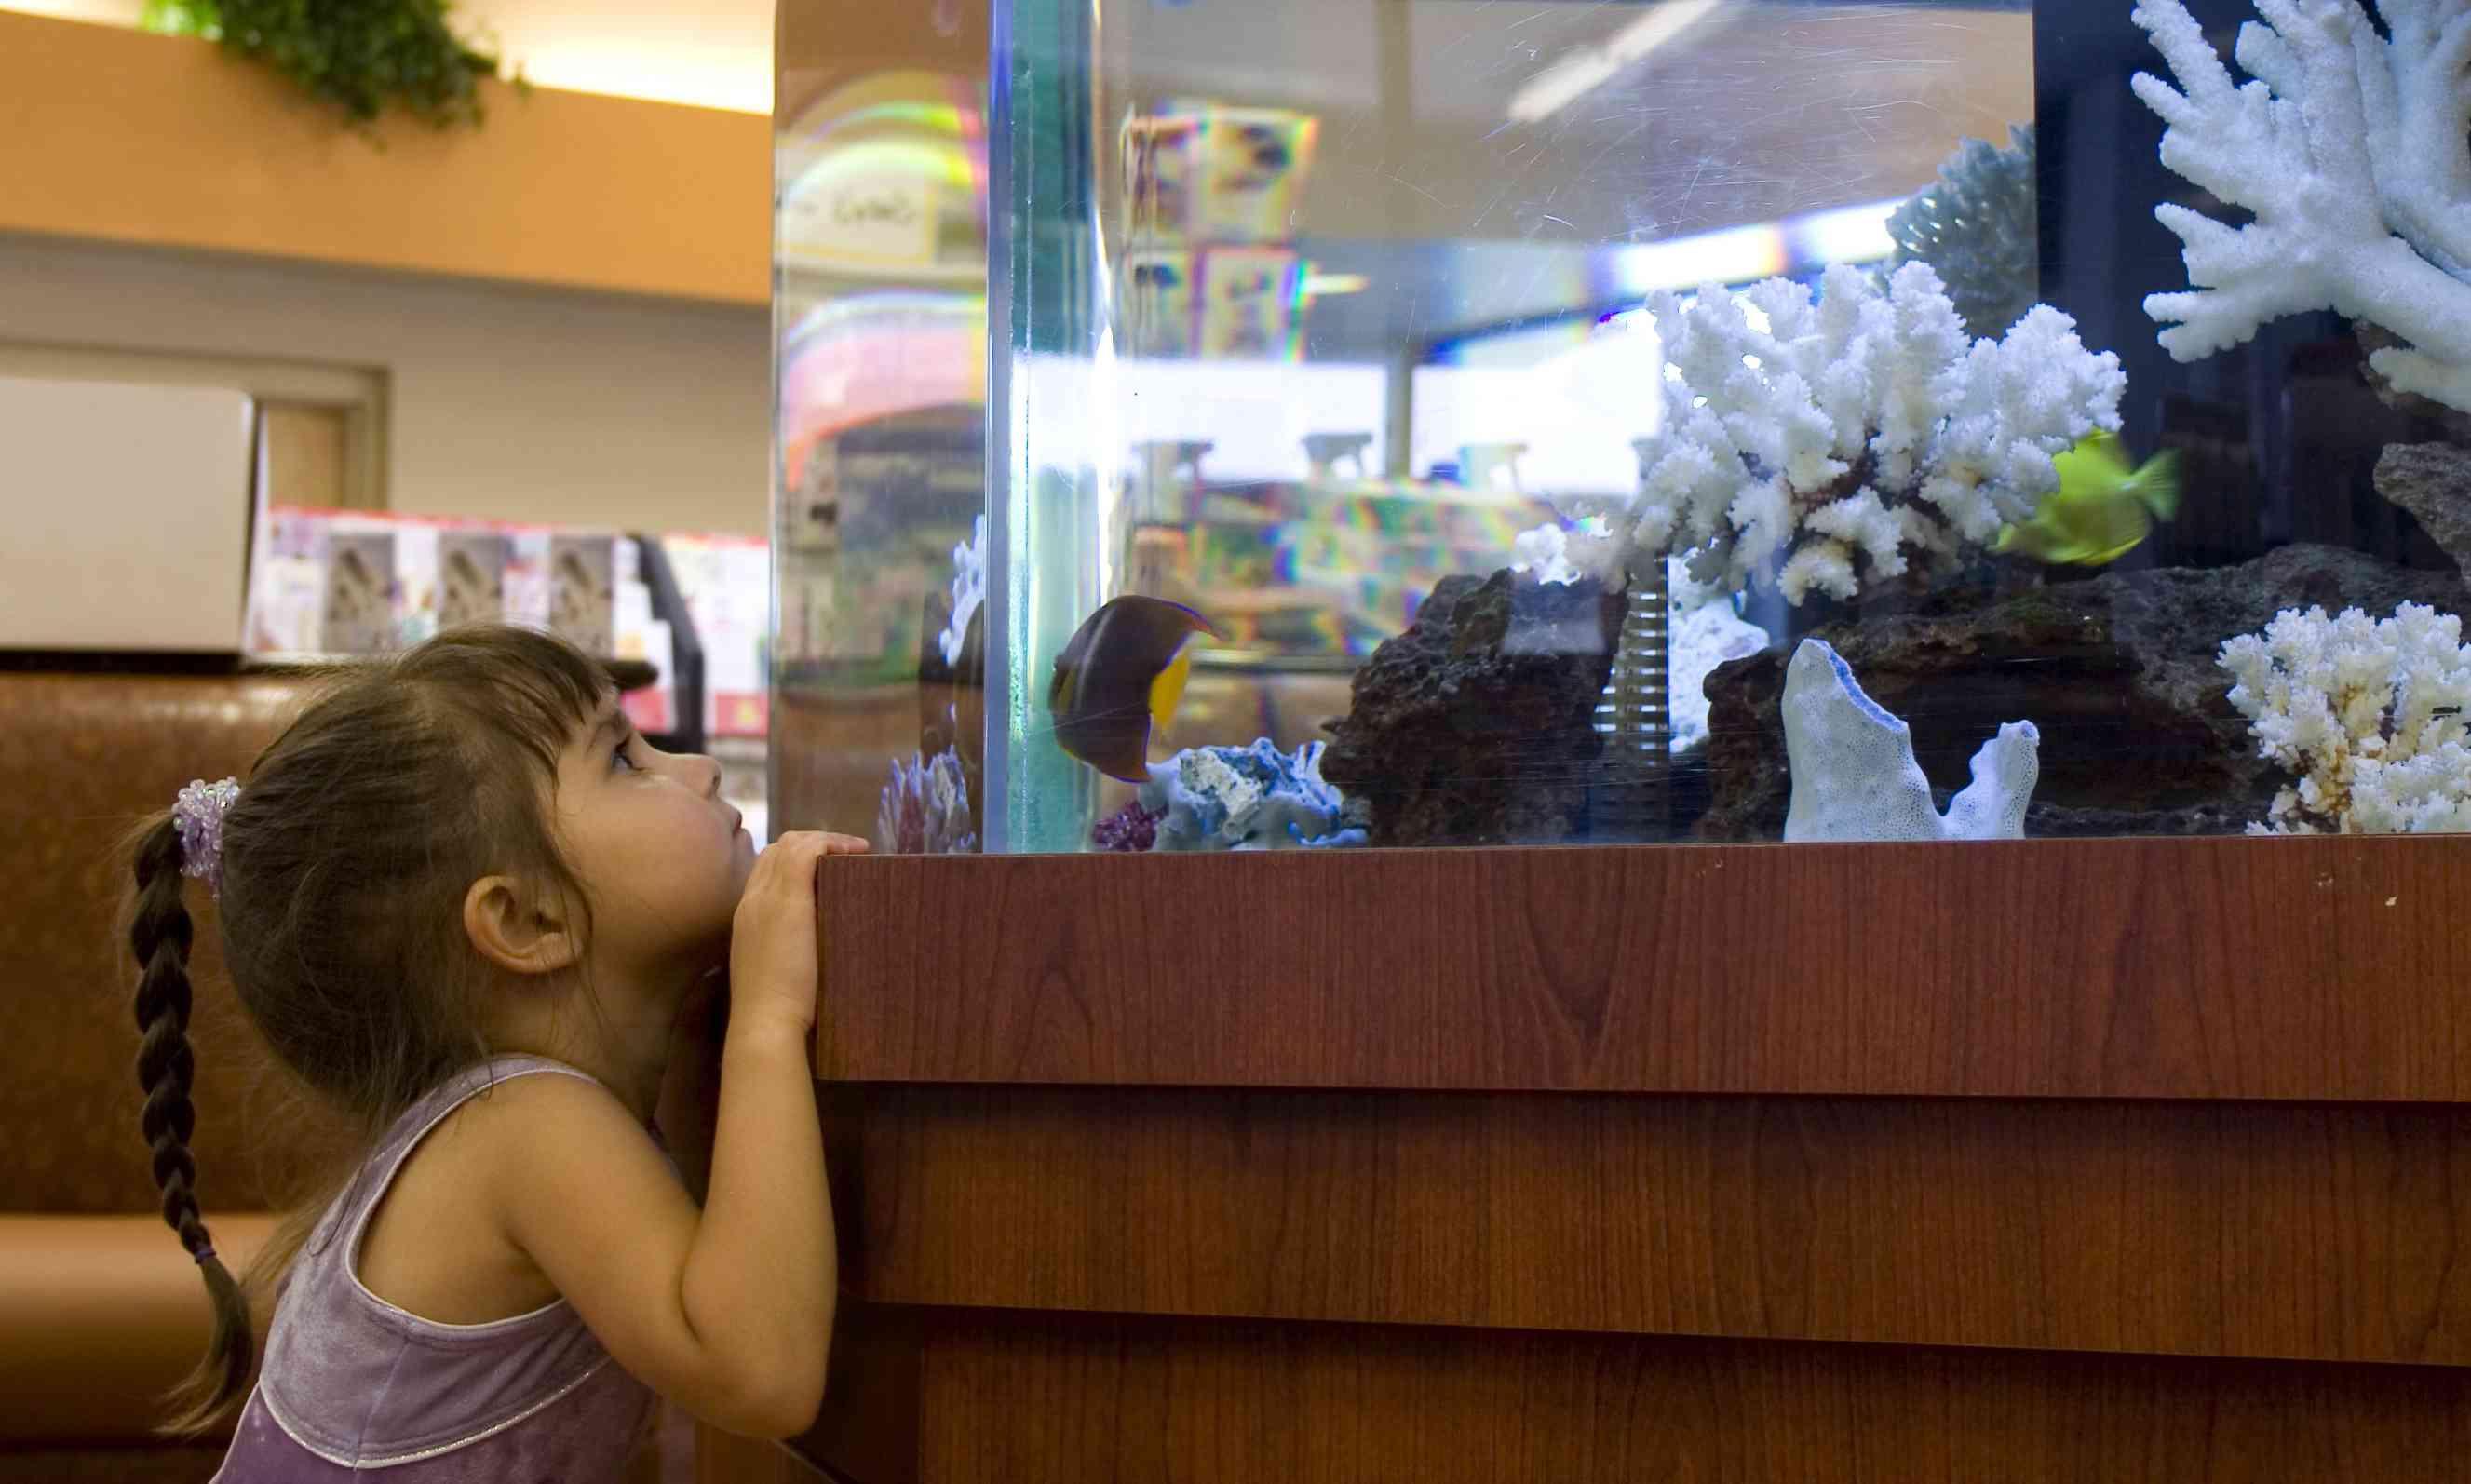 Girl looking at aquarium in waiting room